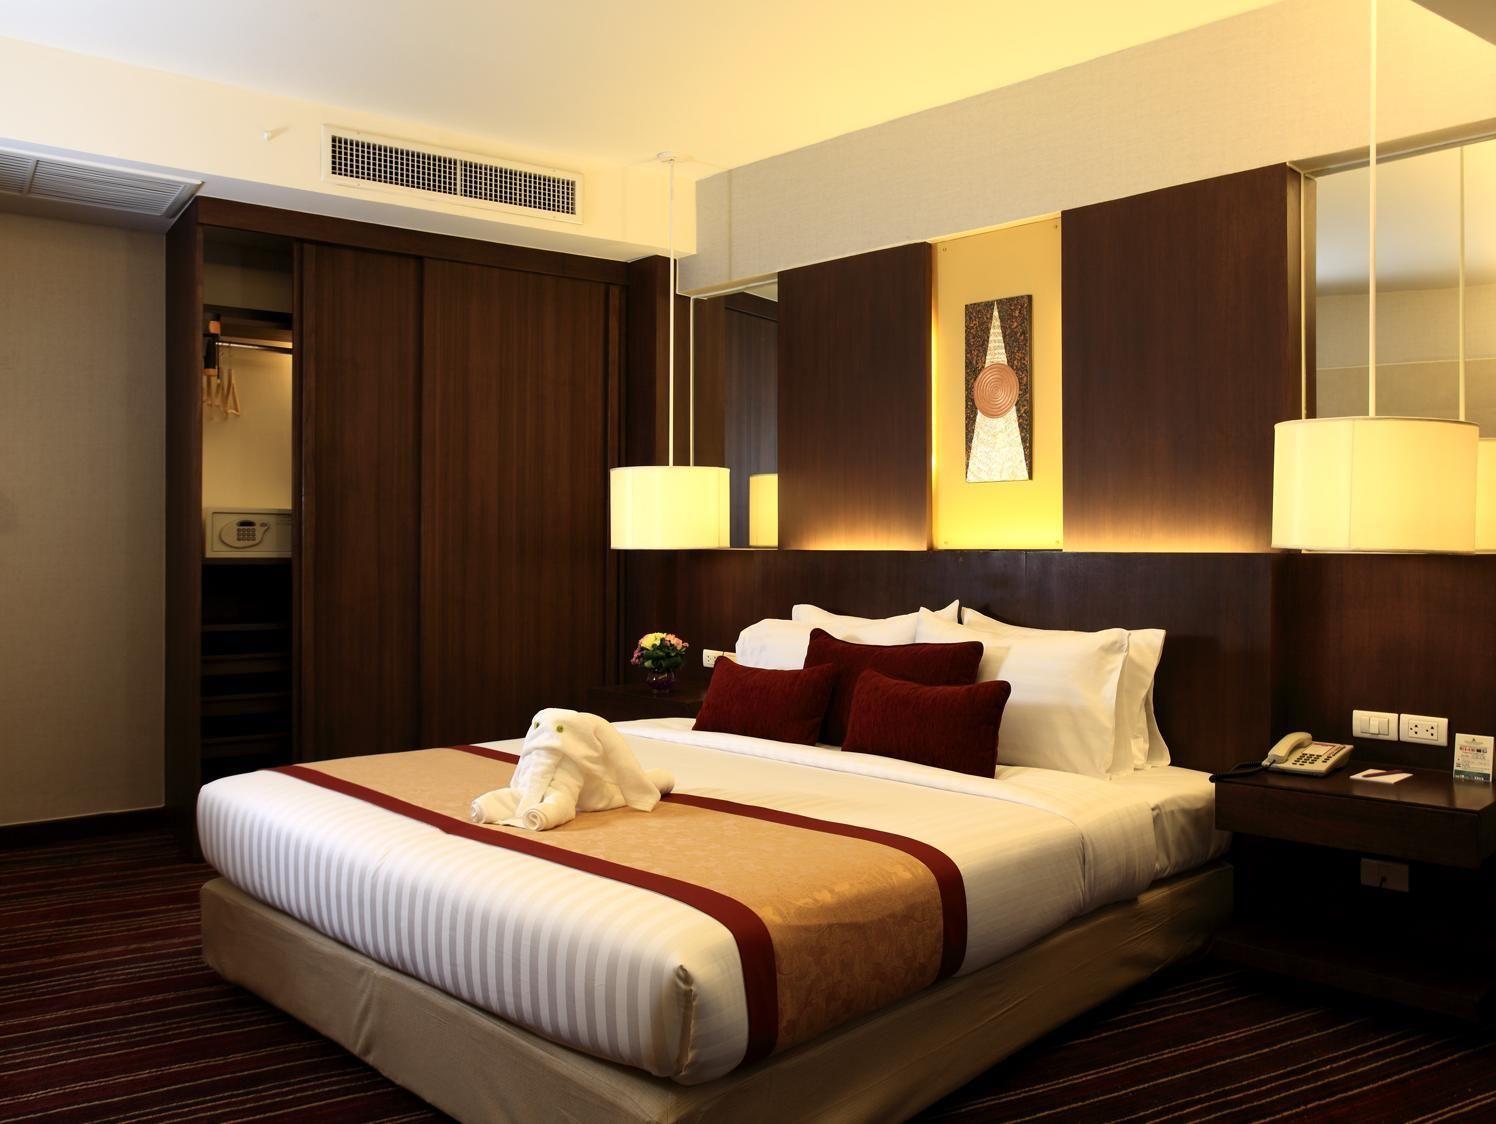 Ambassador Hotel Bangkok Bangkok Thailand Ambassador Hotel Hotel Room